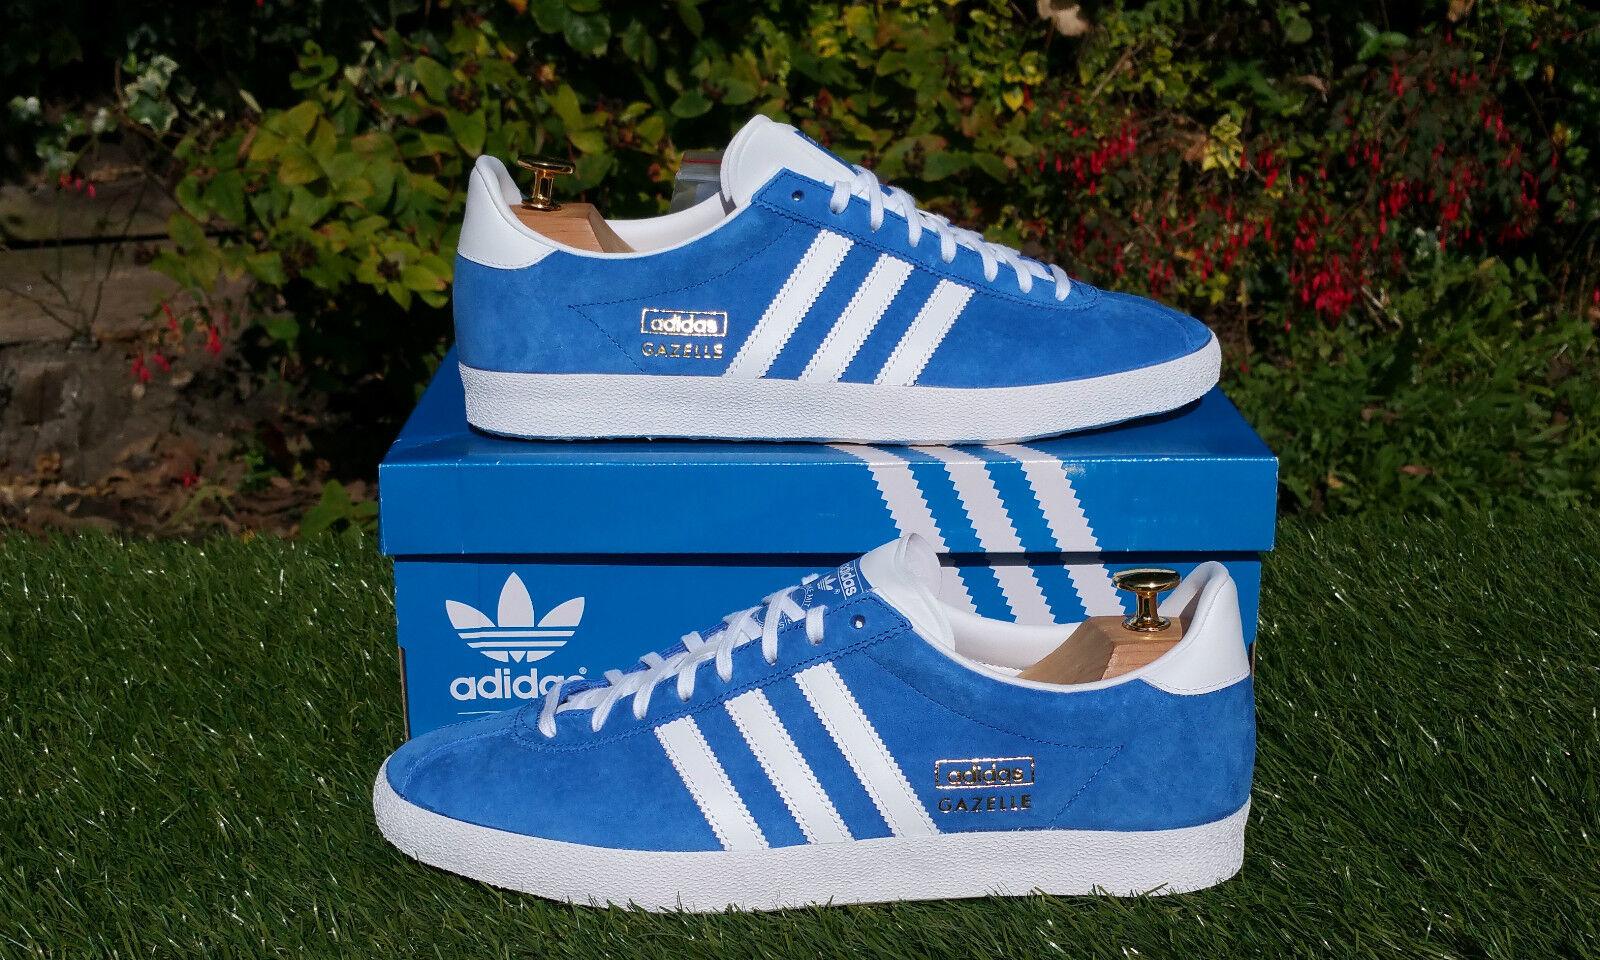 best value 34967 0791a 50%OFF BNWB   Genuine adidas originals Gazelle OG Air Force Blue Suede  trainers UK